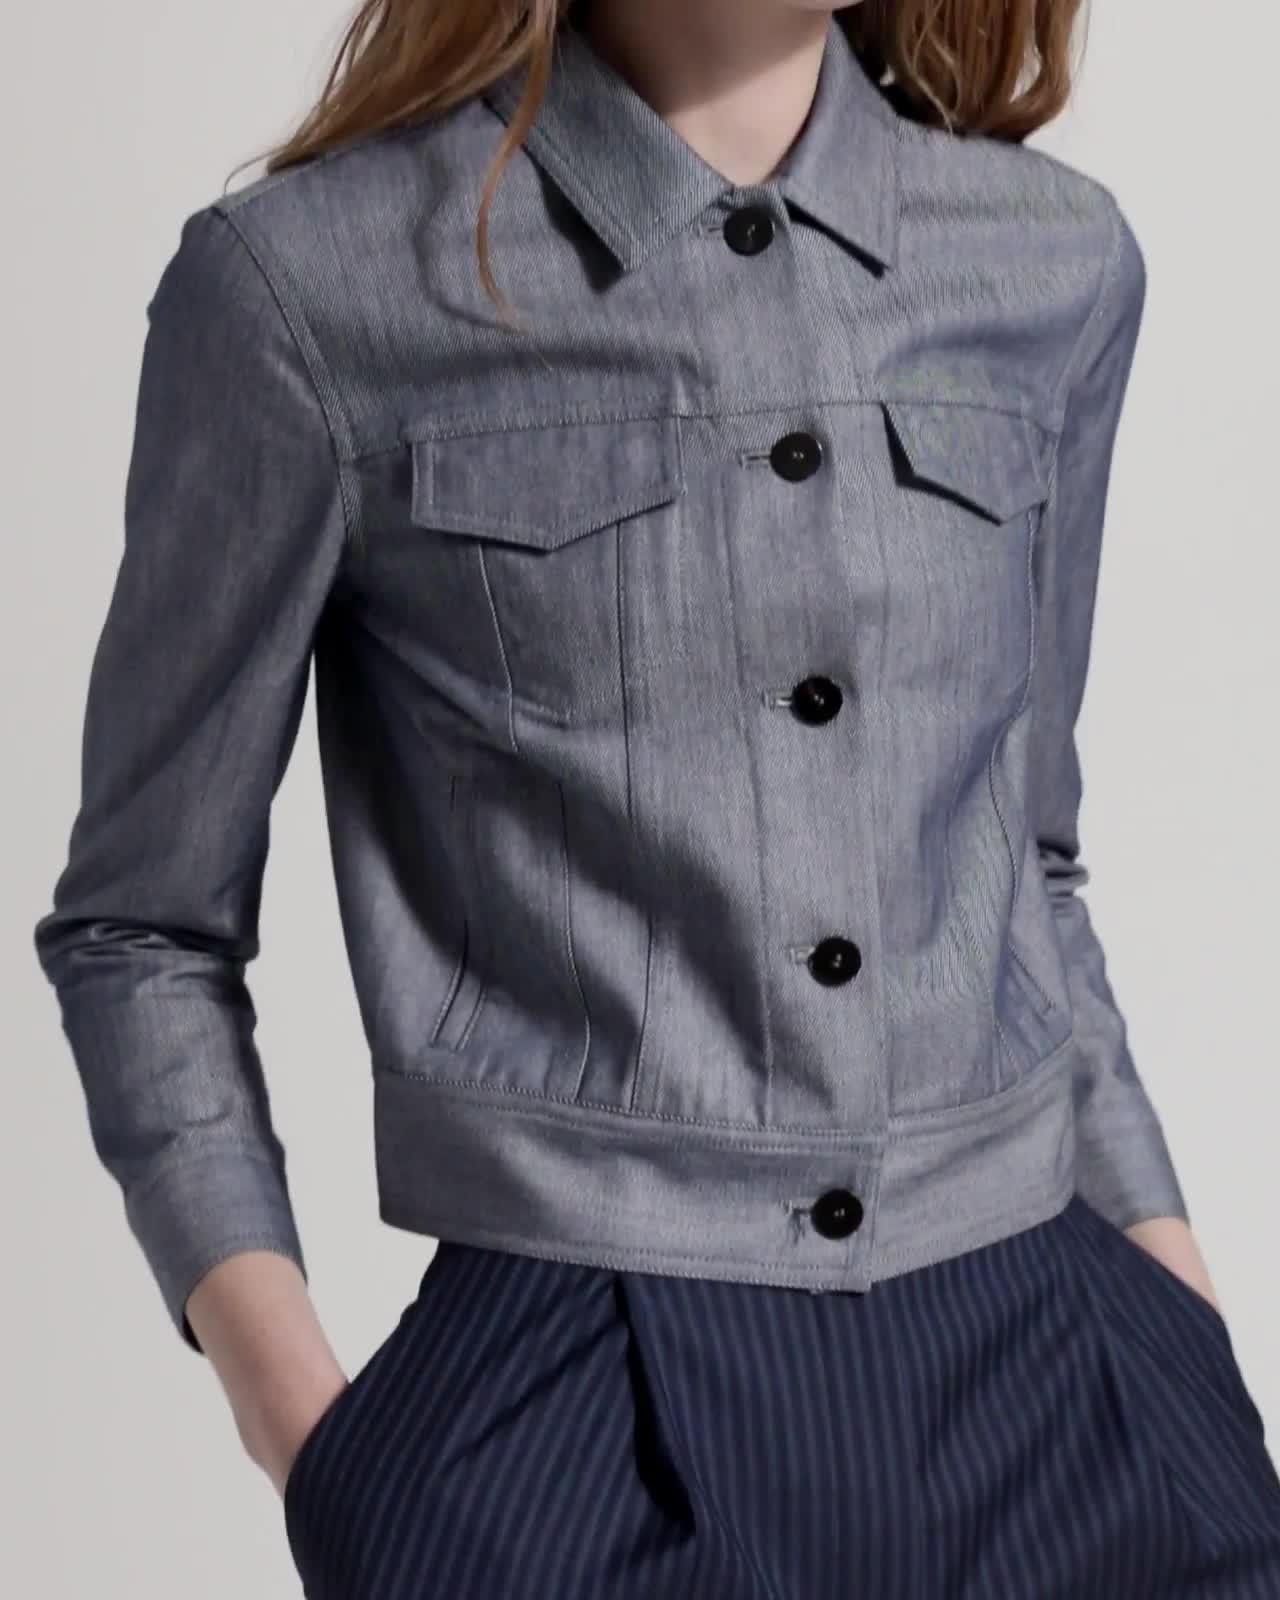 Shrunken-Fit Denim Jacket